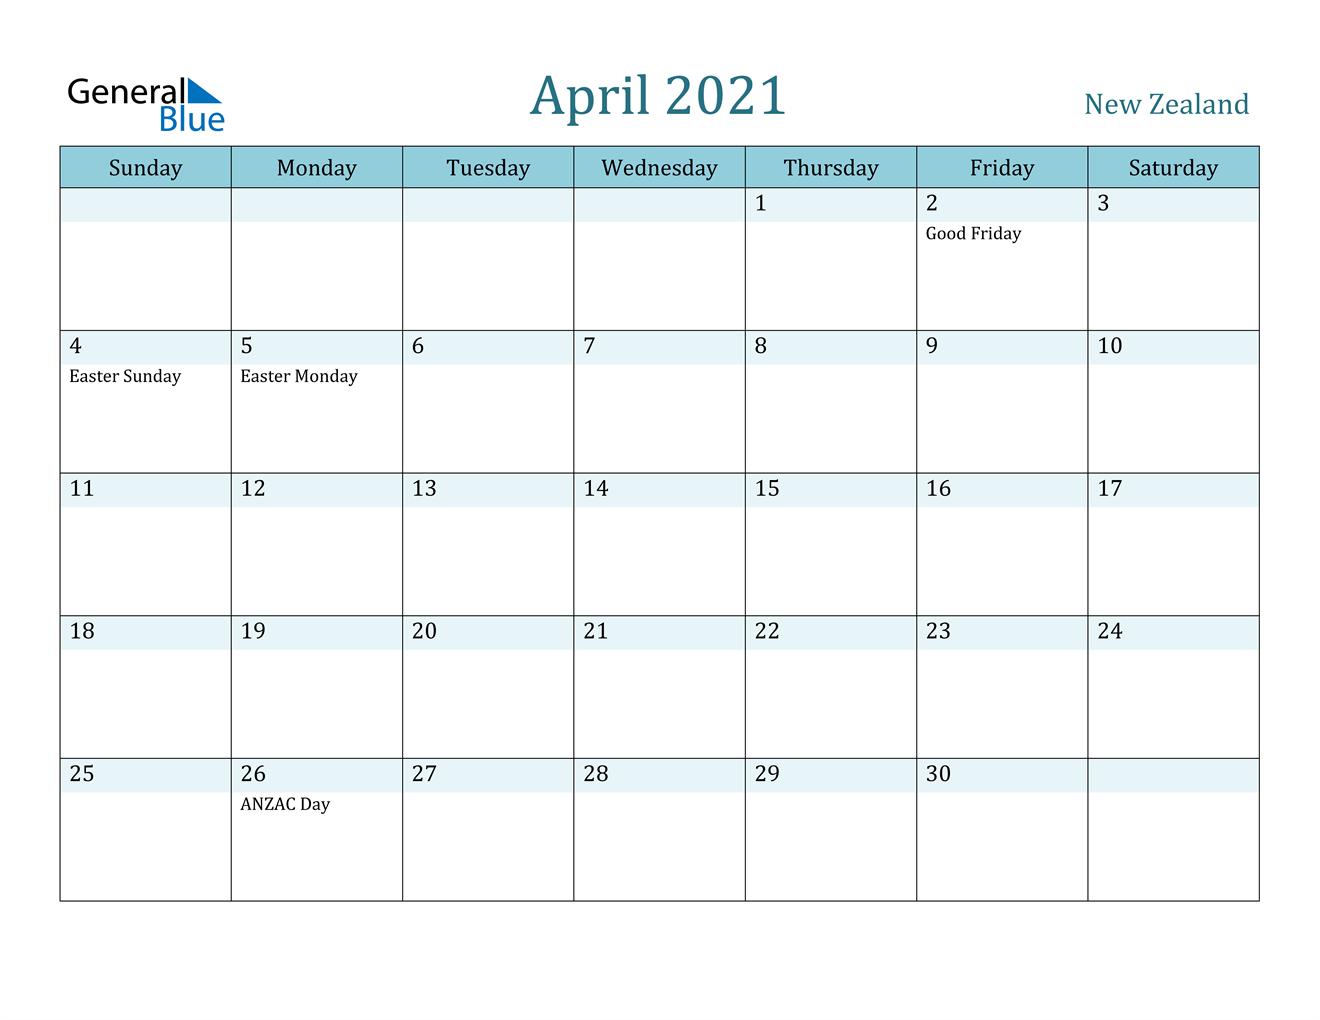 April 2021 Calendar - New Zealand